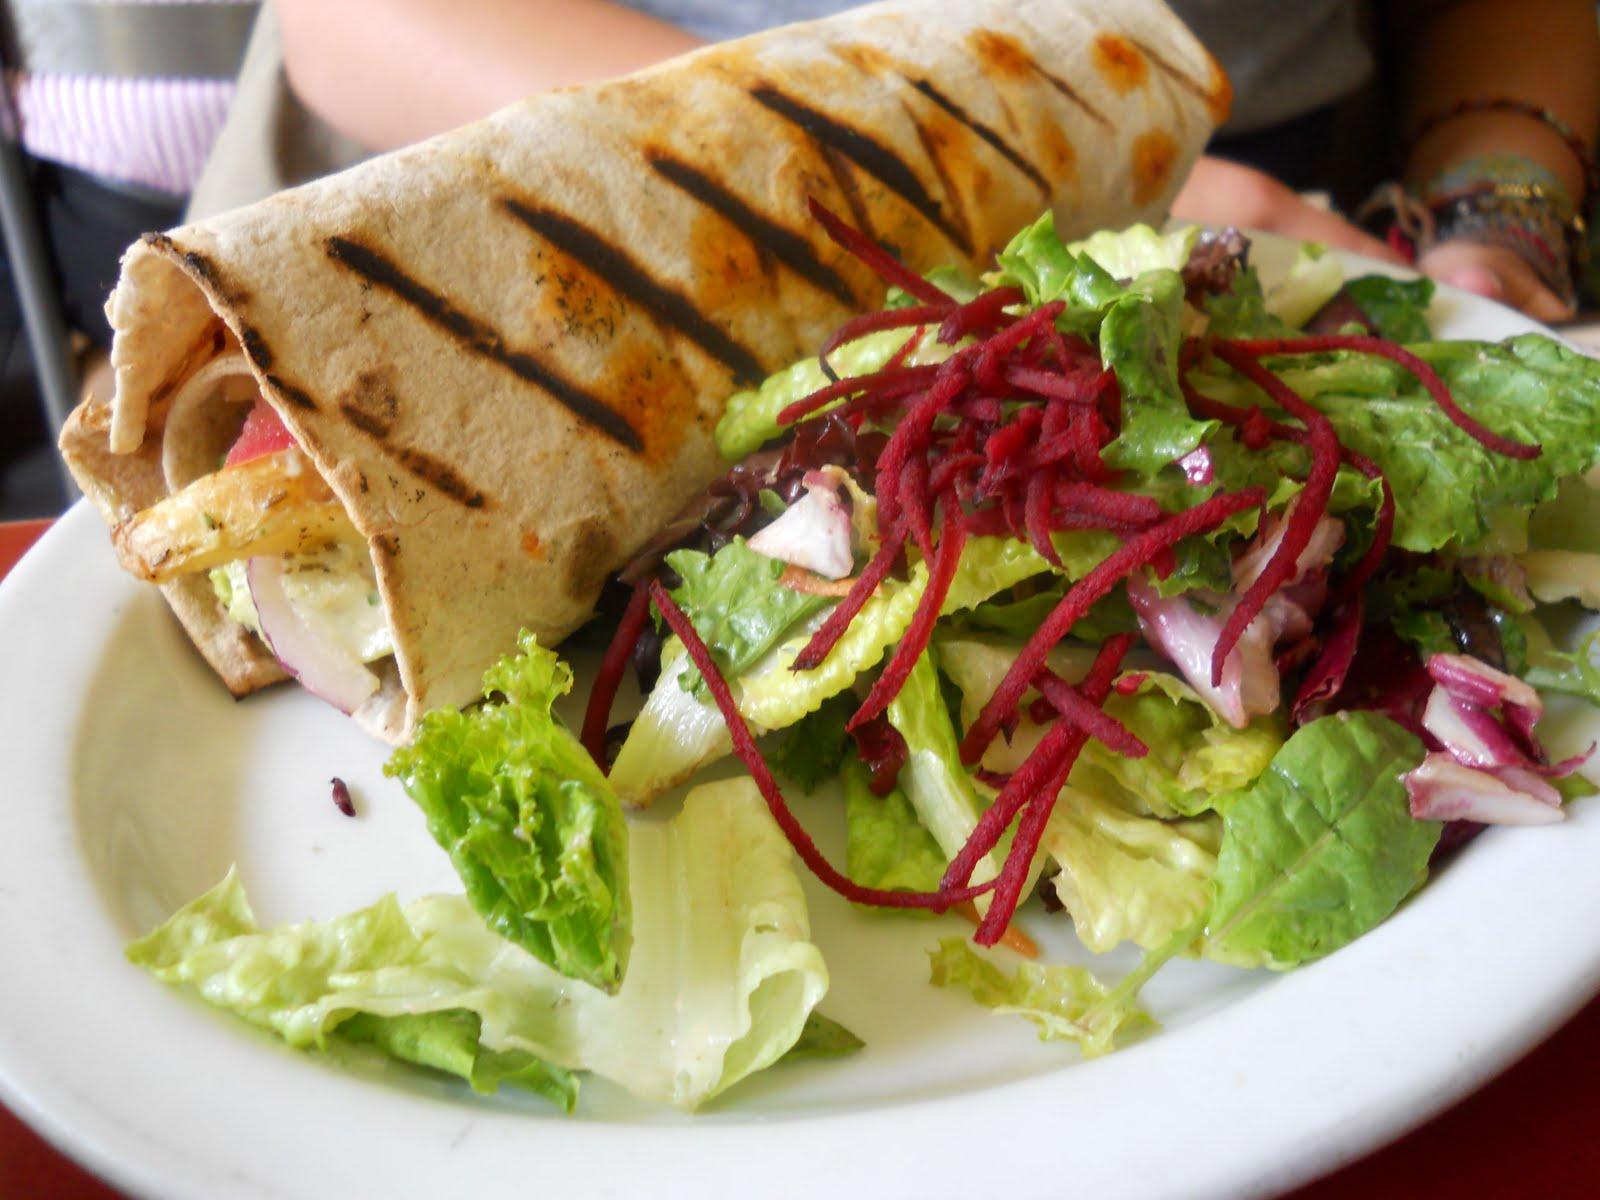 Several vn staffers enjoyed herbivore s signature shawarma eggplant